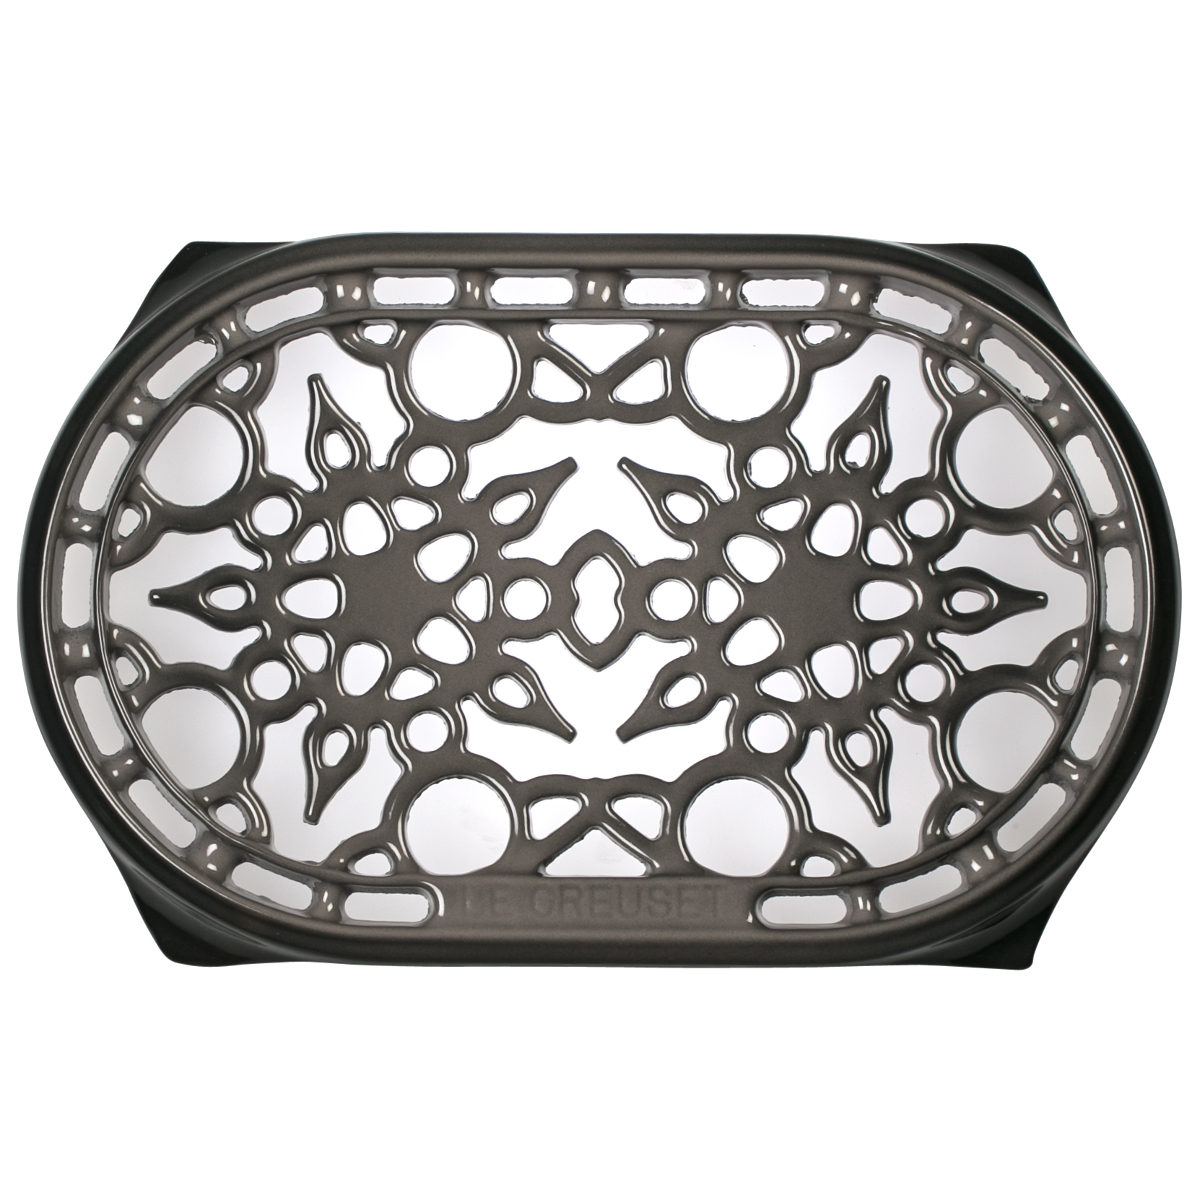 Le Creuset Oyster Enameled Cast Iron 10.5 Inch Oval Trivet